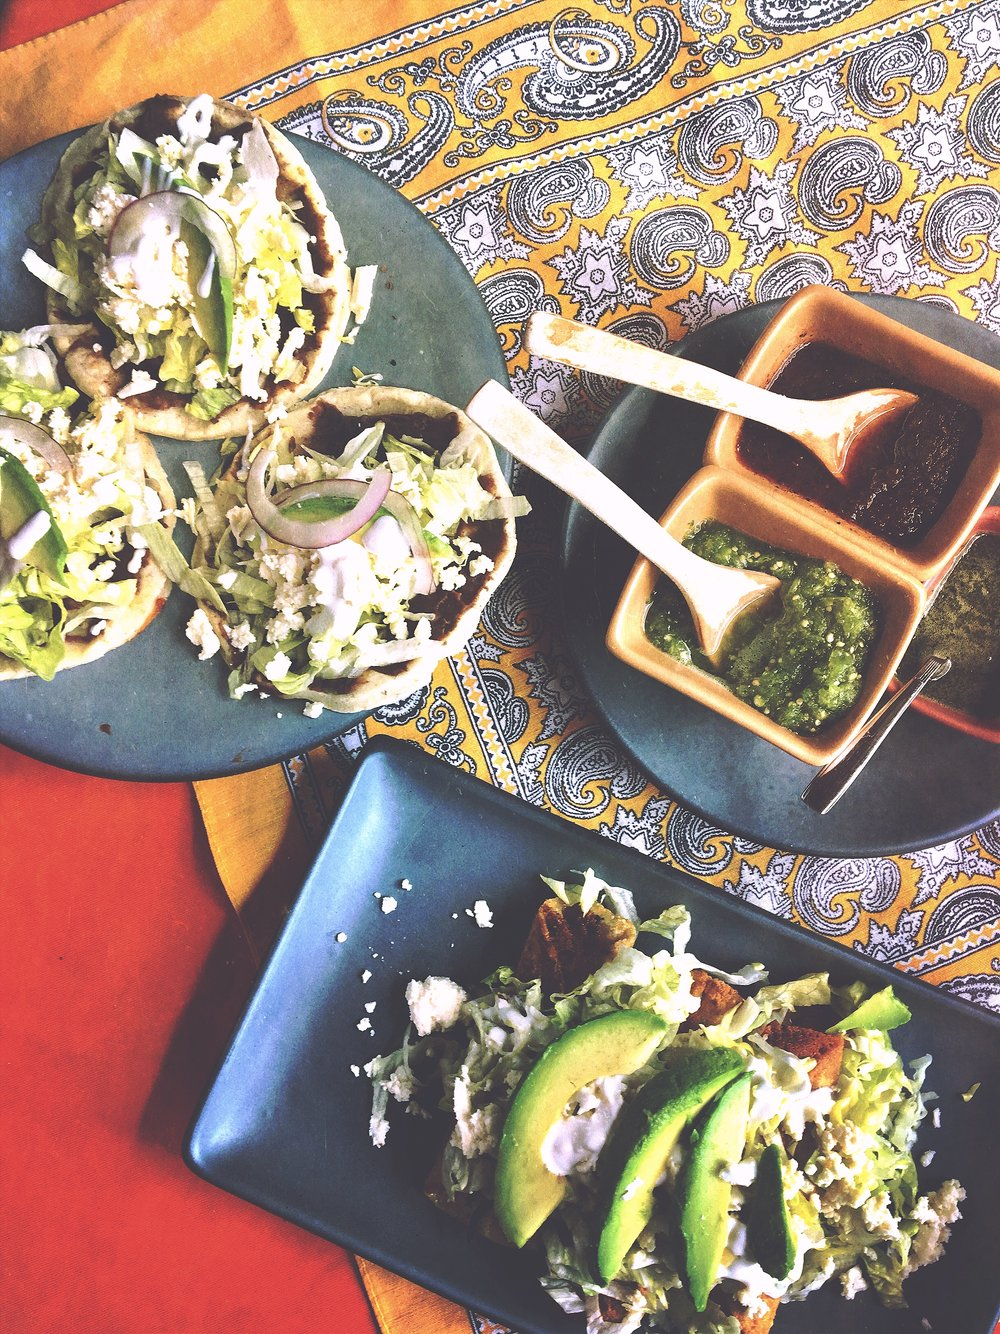 Sopas + Flautas at Yerbabuena Restaurant